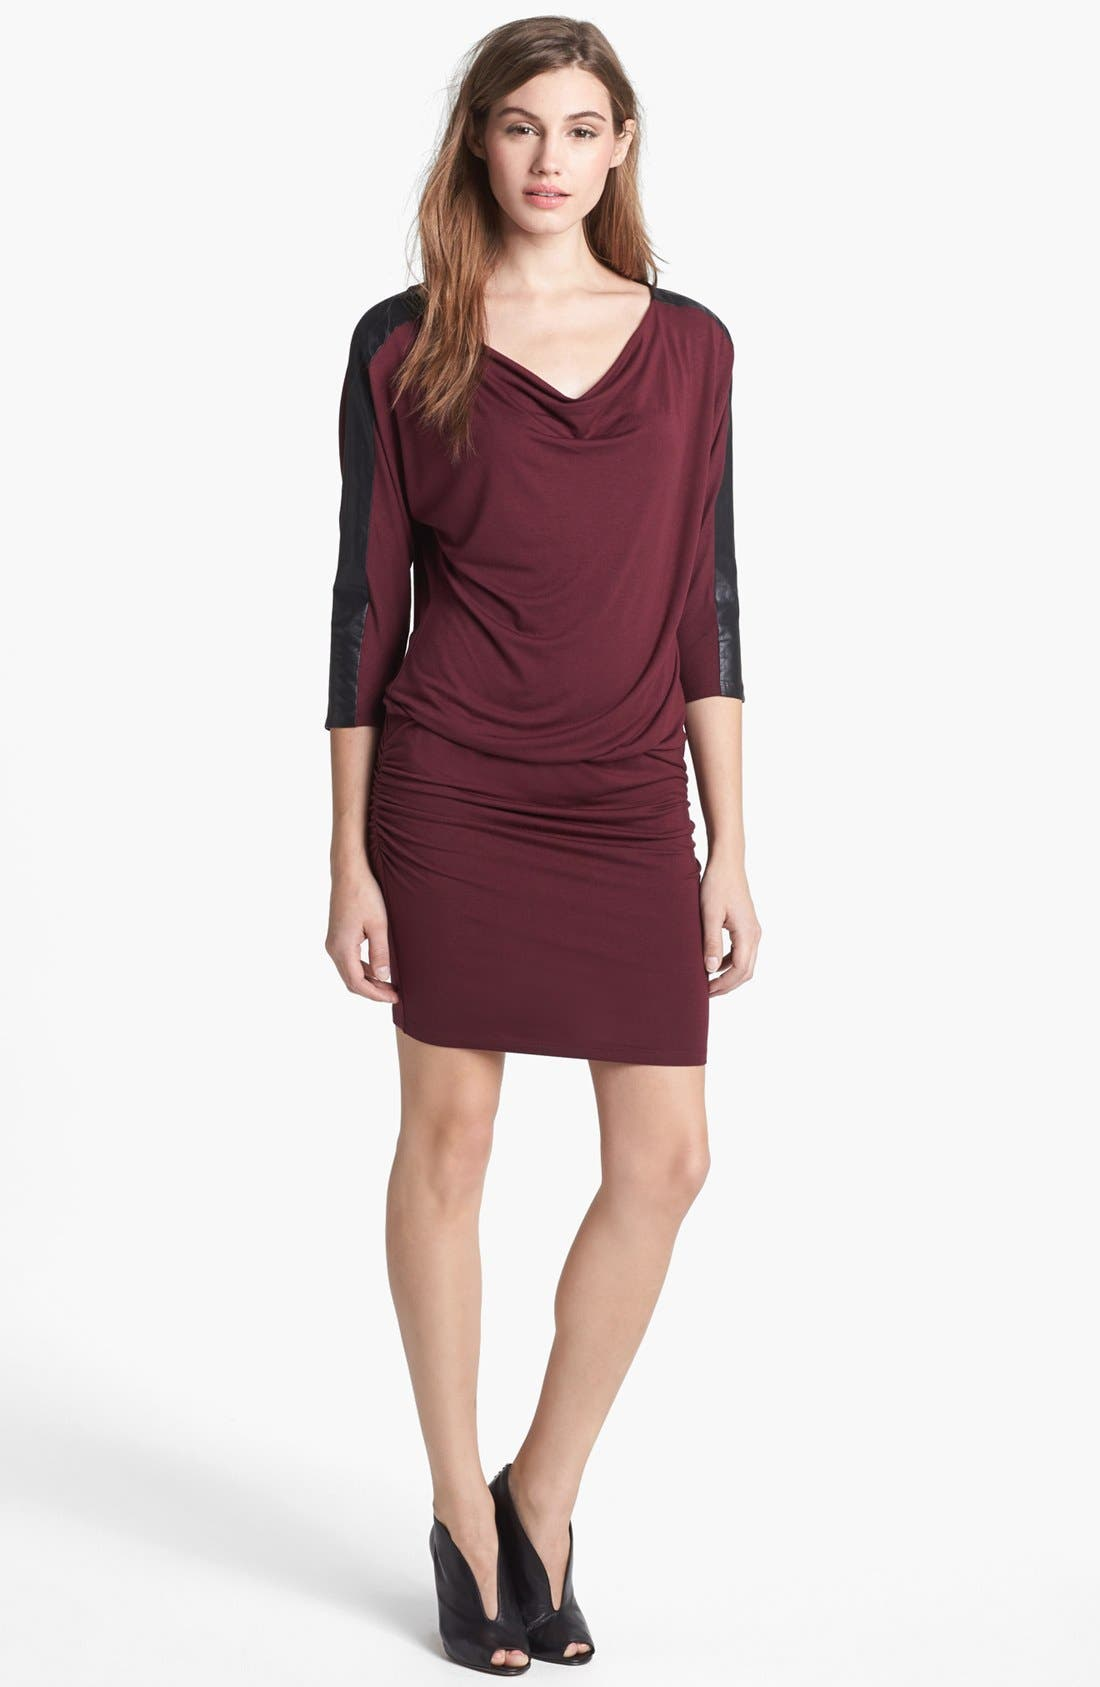 Main Image - C & C California Faux Leather & Ponte Knit Dress